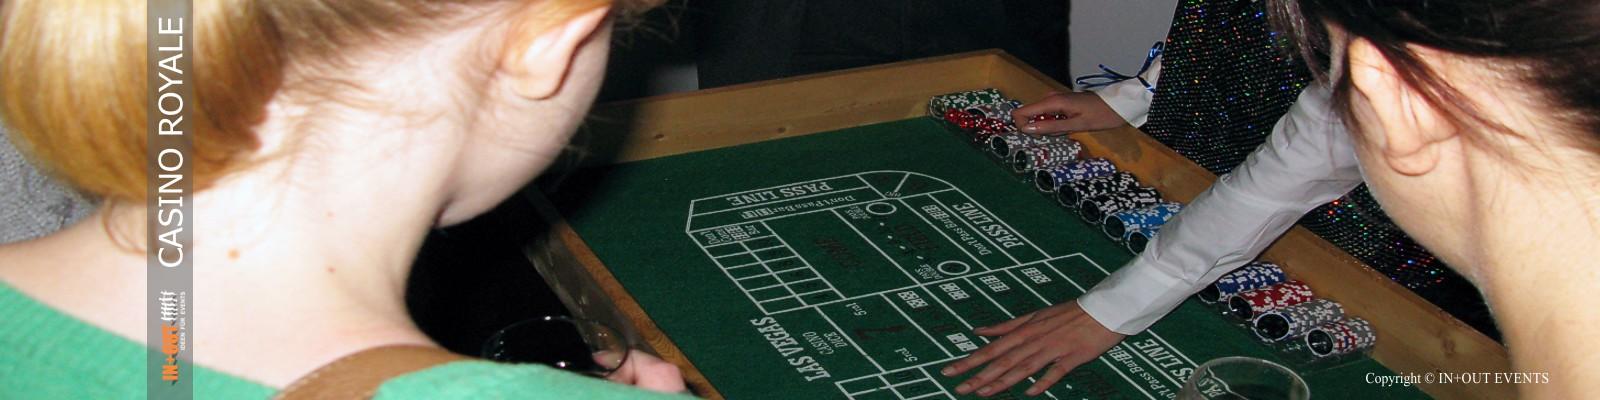 casino royale firma